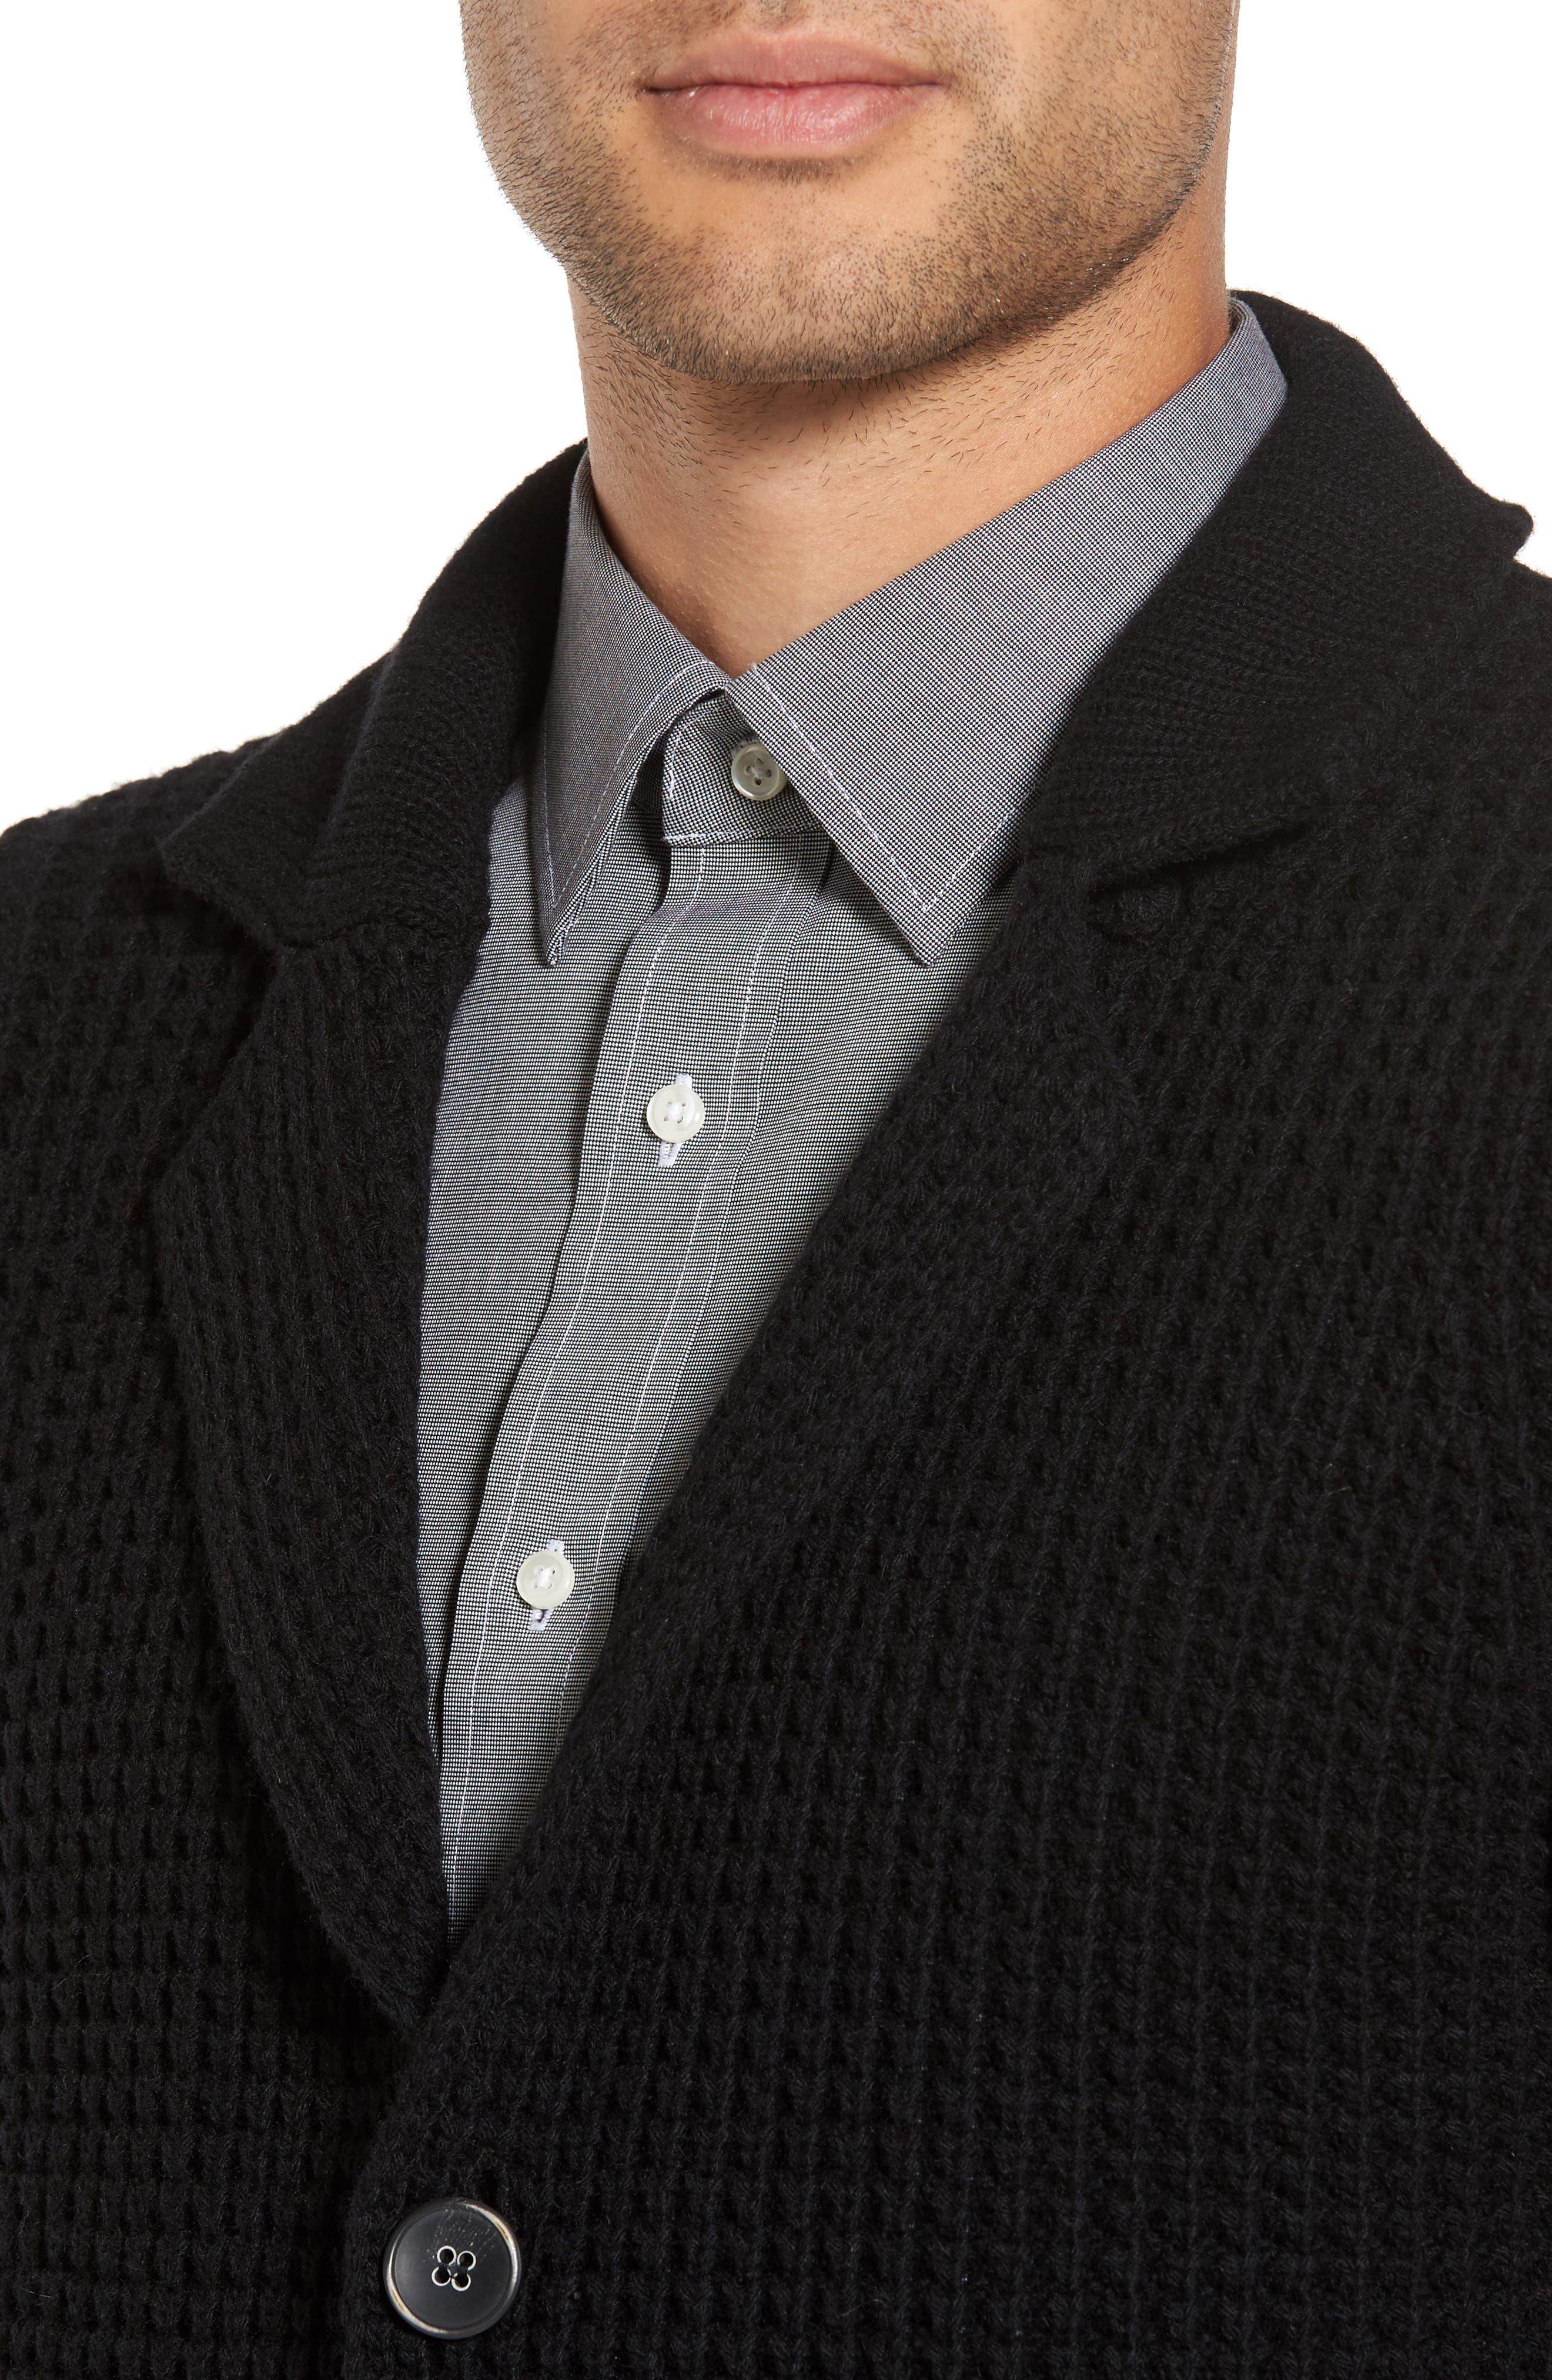 Trim Fit Knit Cardigan Jacket,                             Alternate thumbnail 4, color,                             001